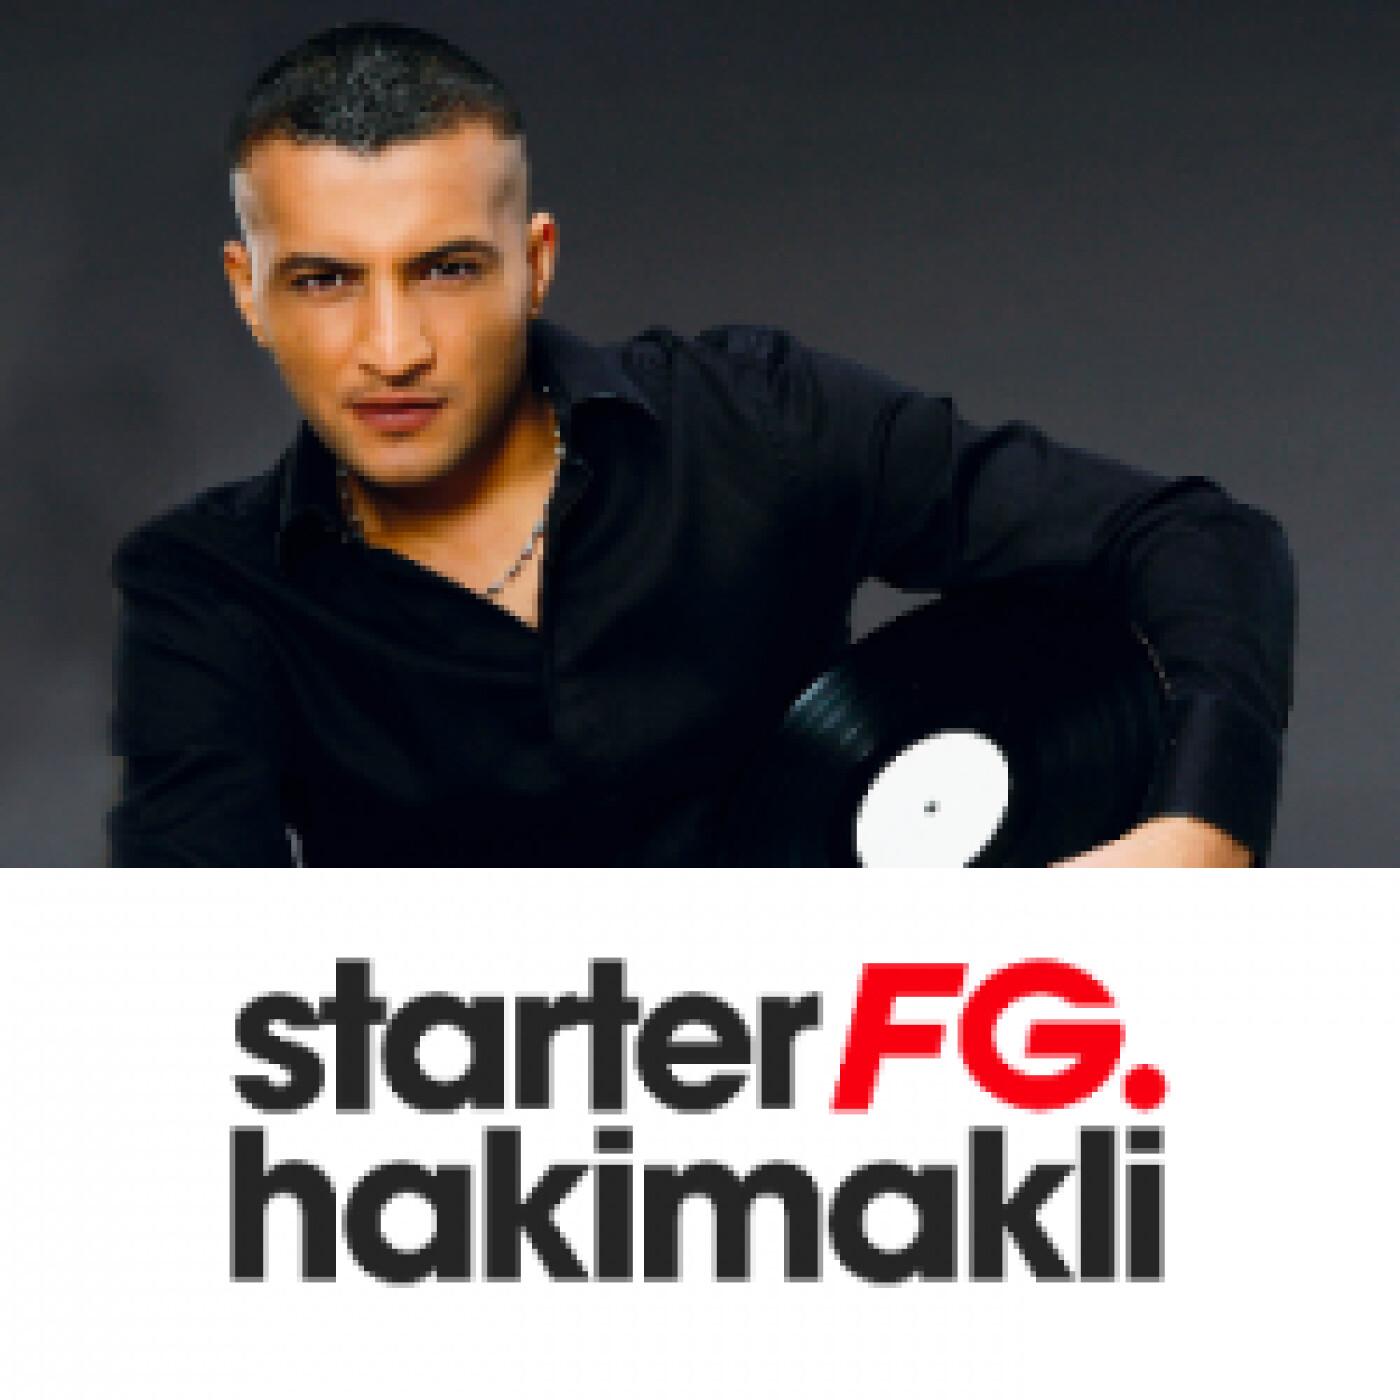 STARTER FG BY HAKIMAKLI MERCREDI 23 JUIN 2021